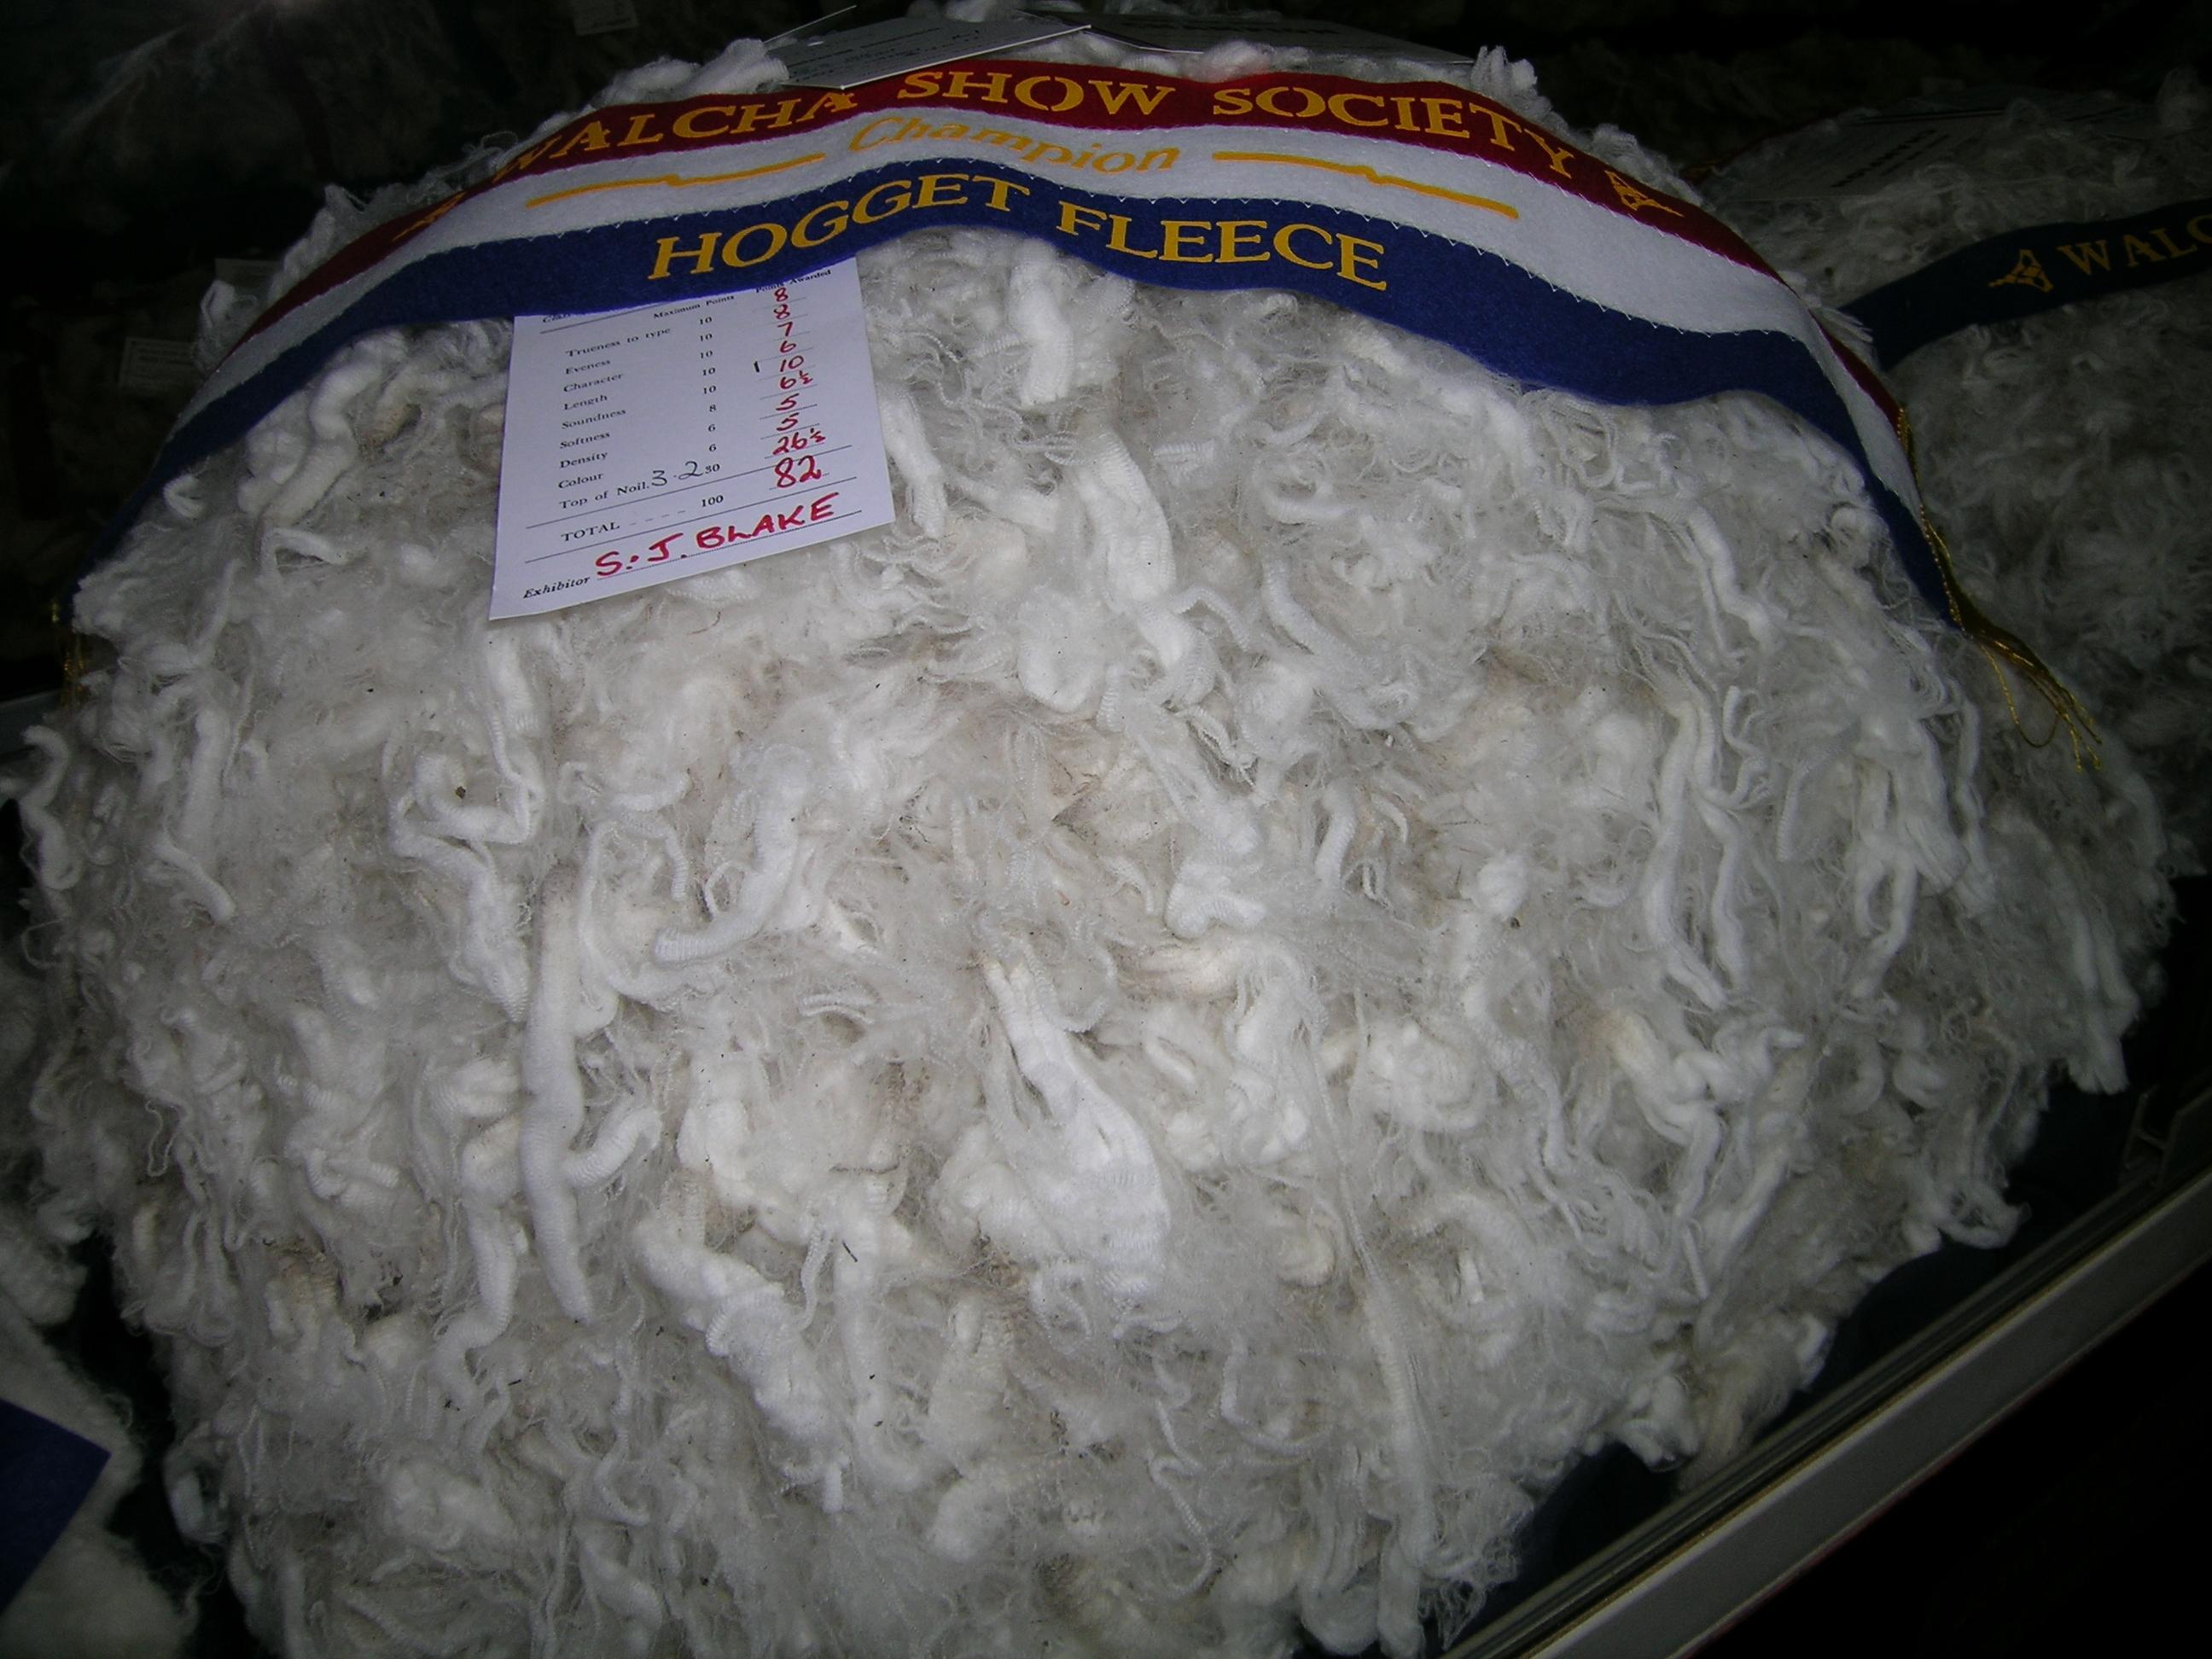 Champion hogget fleece, Walcha Show